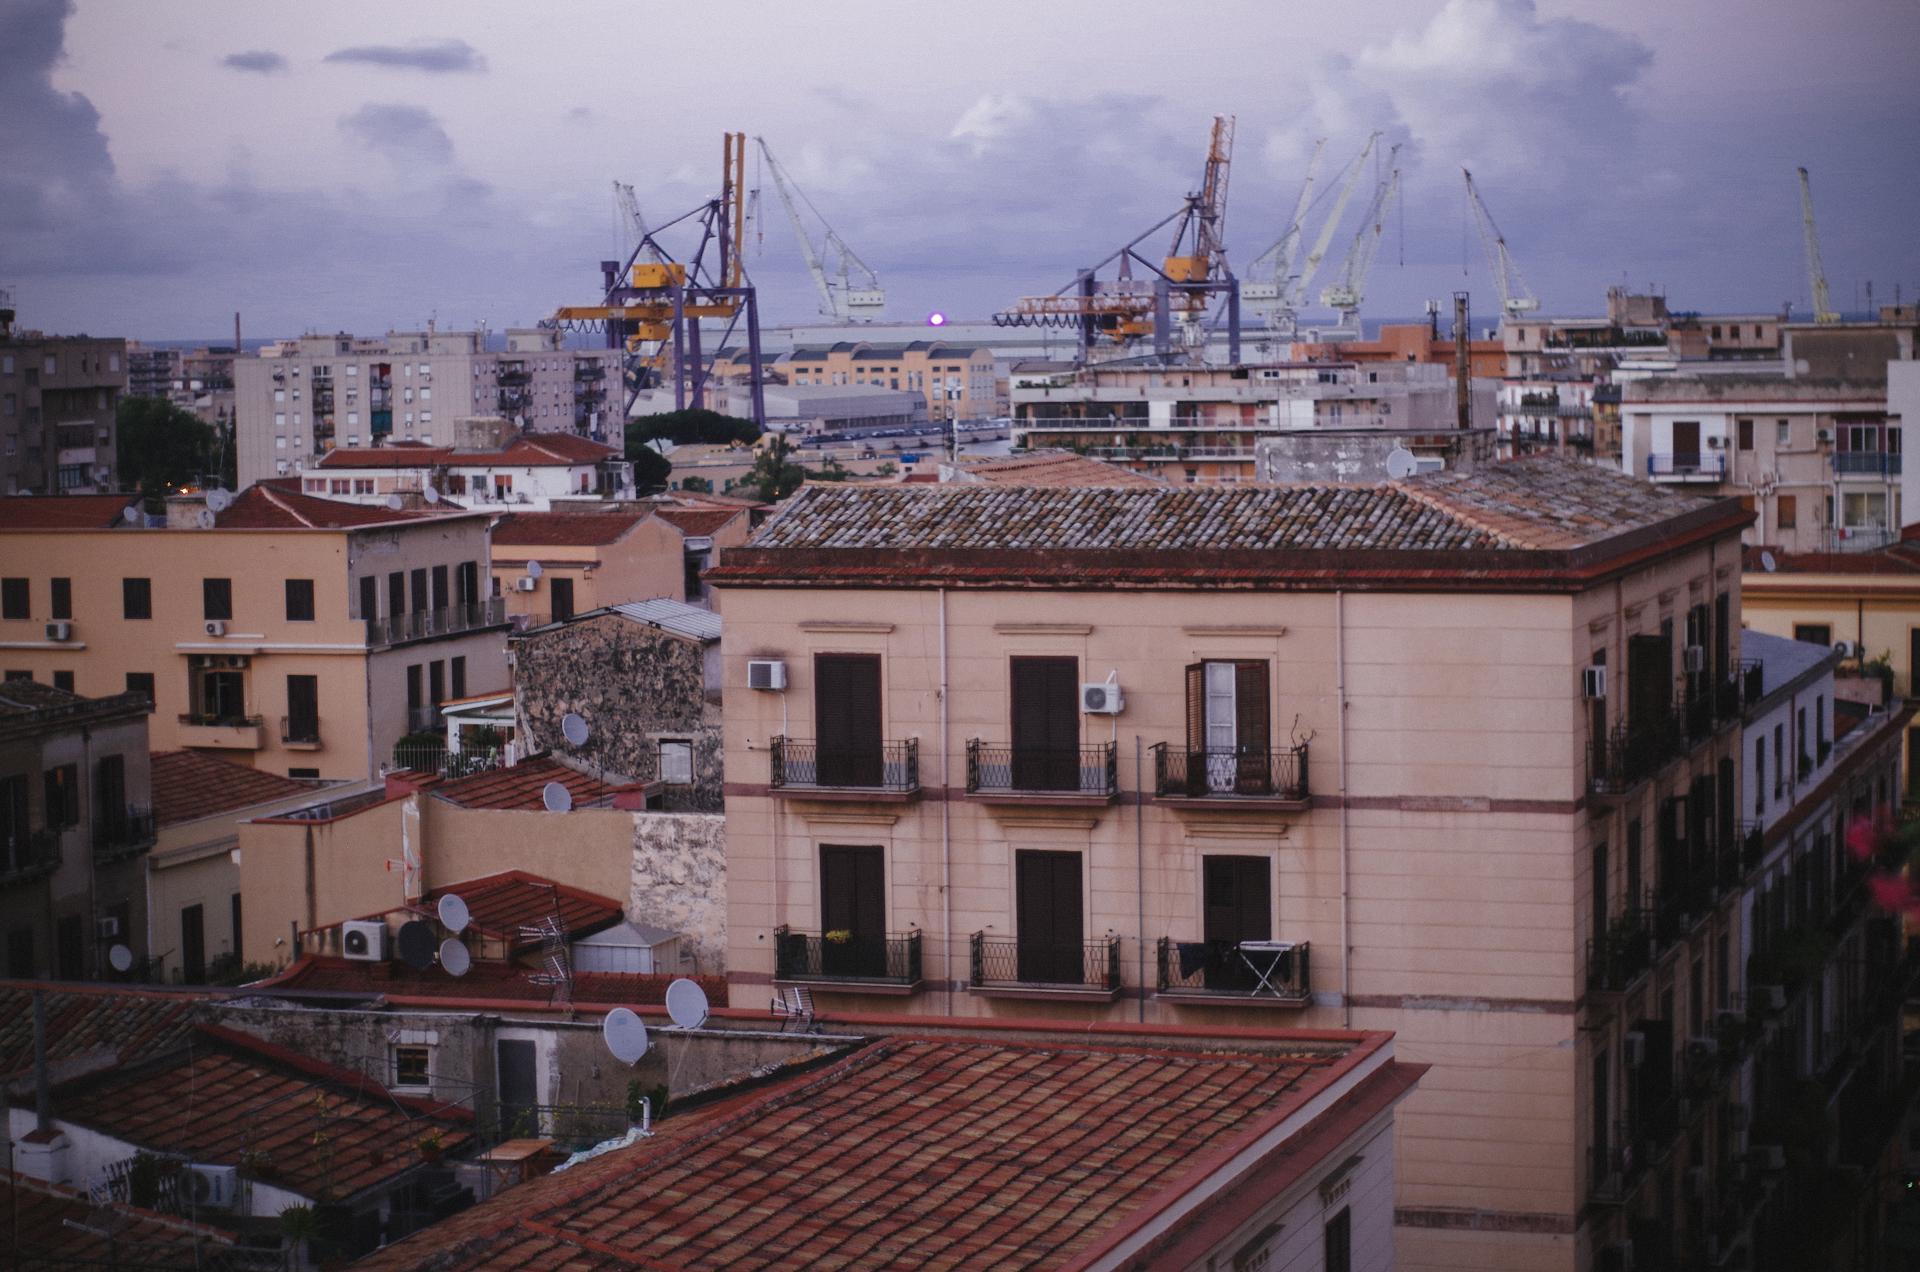 SICILY - Palermo